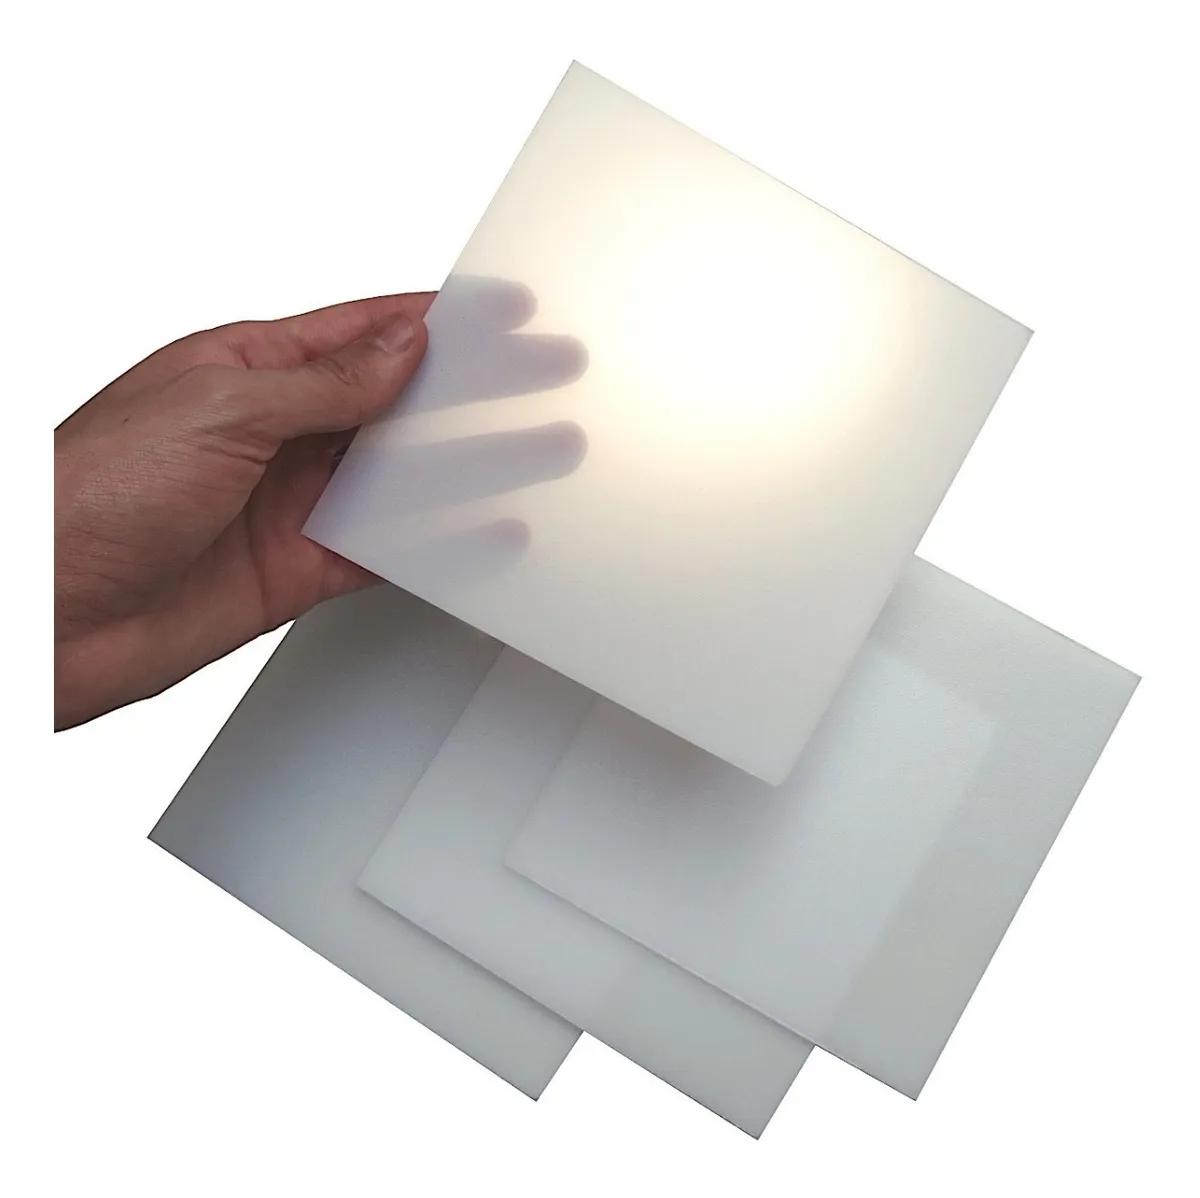 Chapa poliestireno luminaria 2mmX1000mmX2000mm